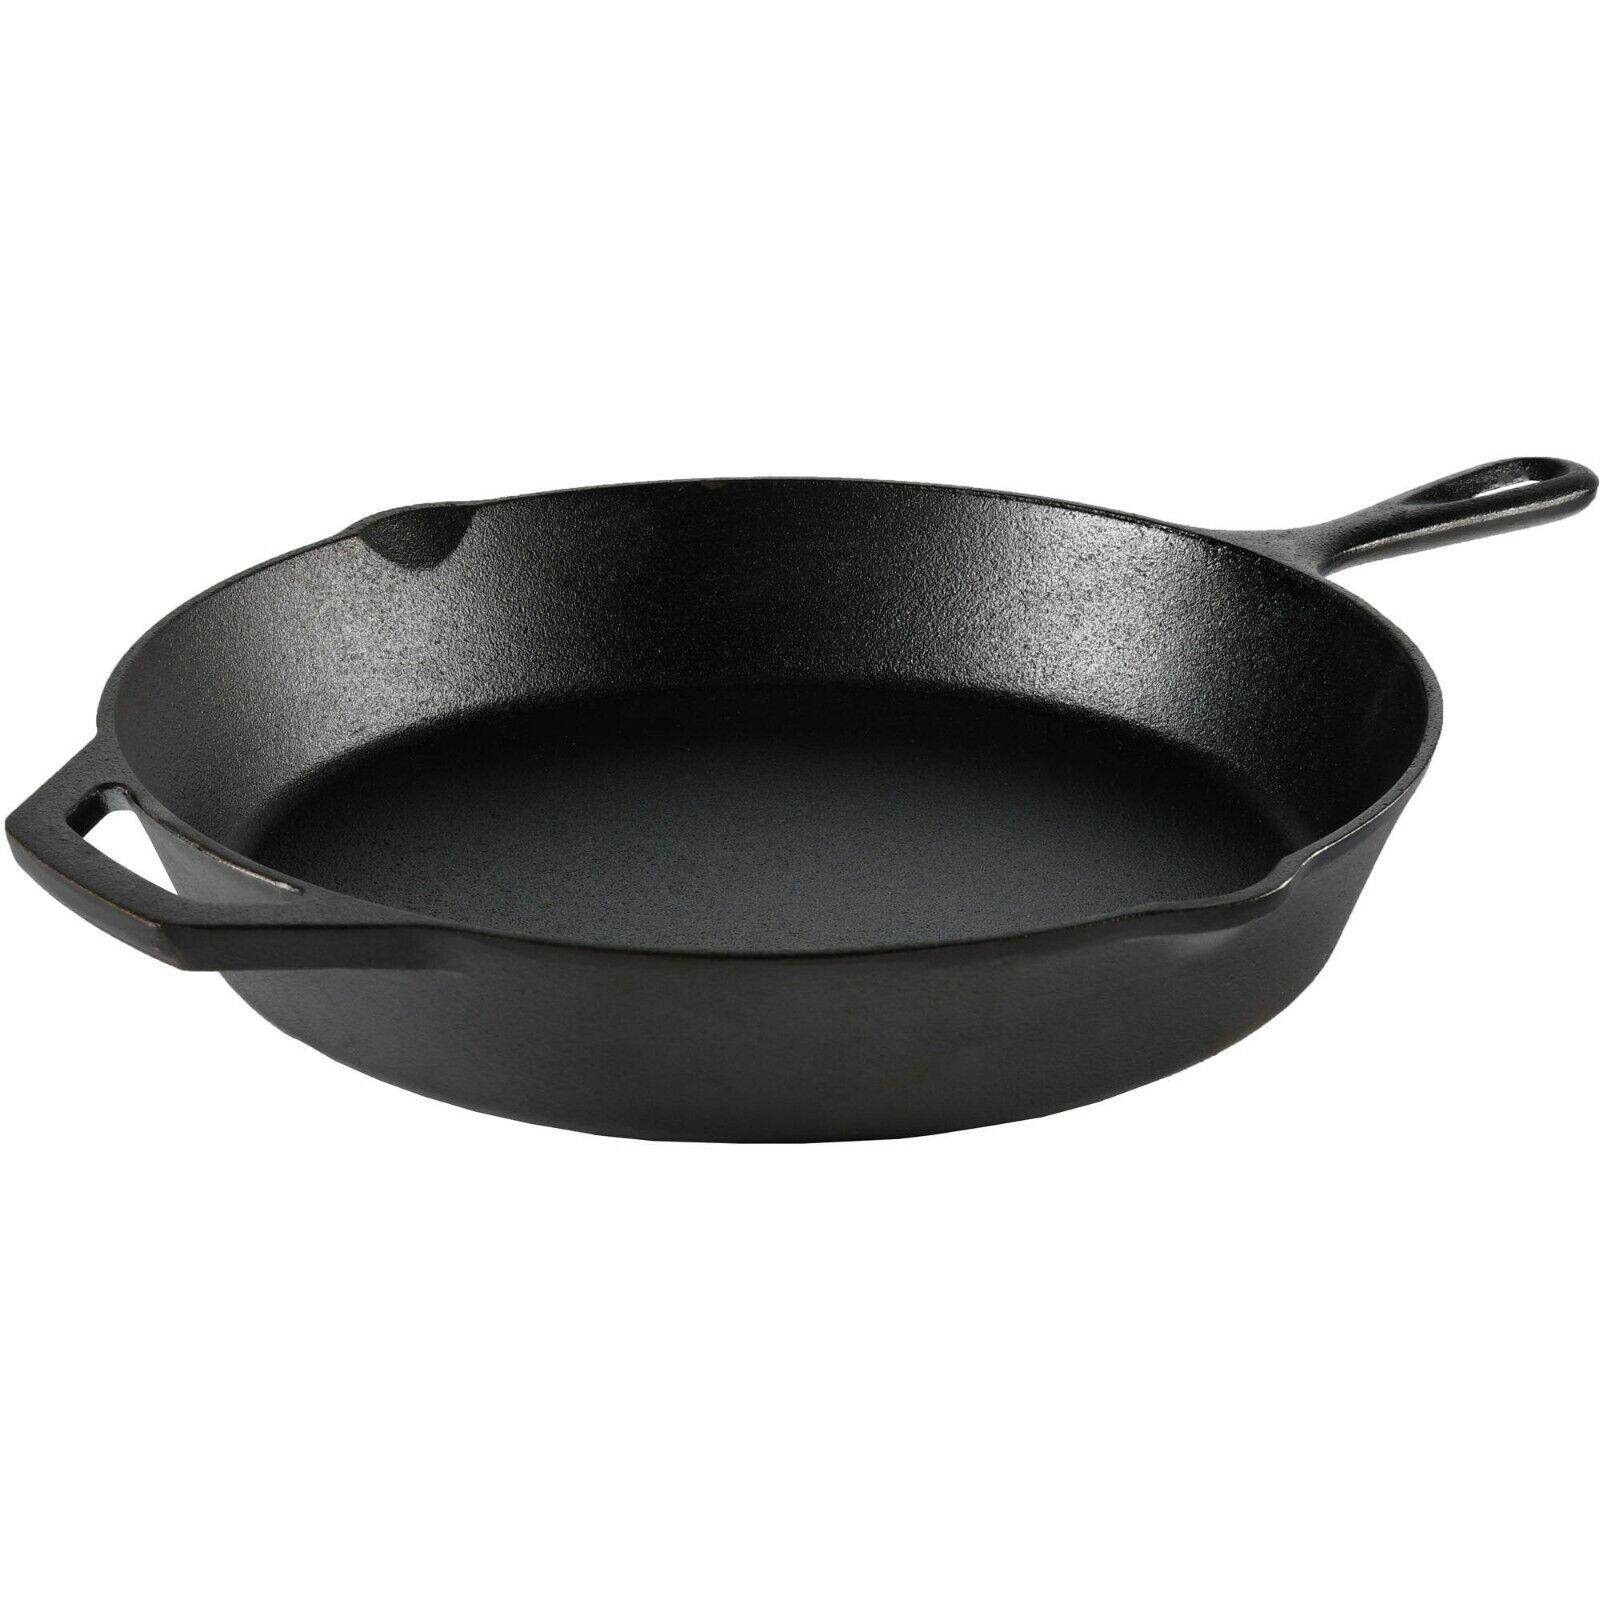 cast iron frying pan skillet pre seasoned